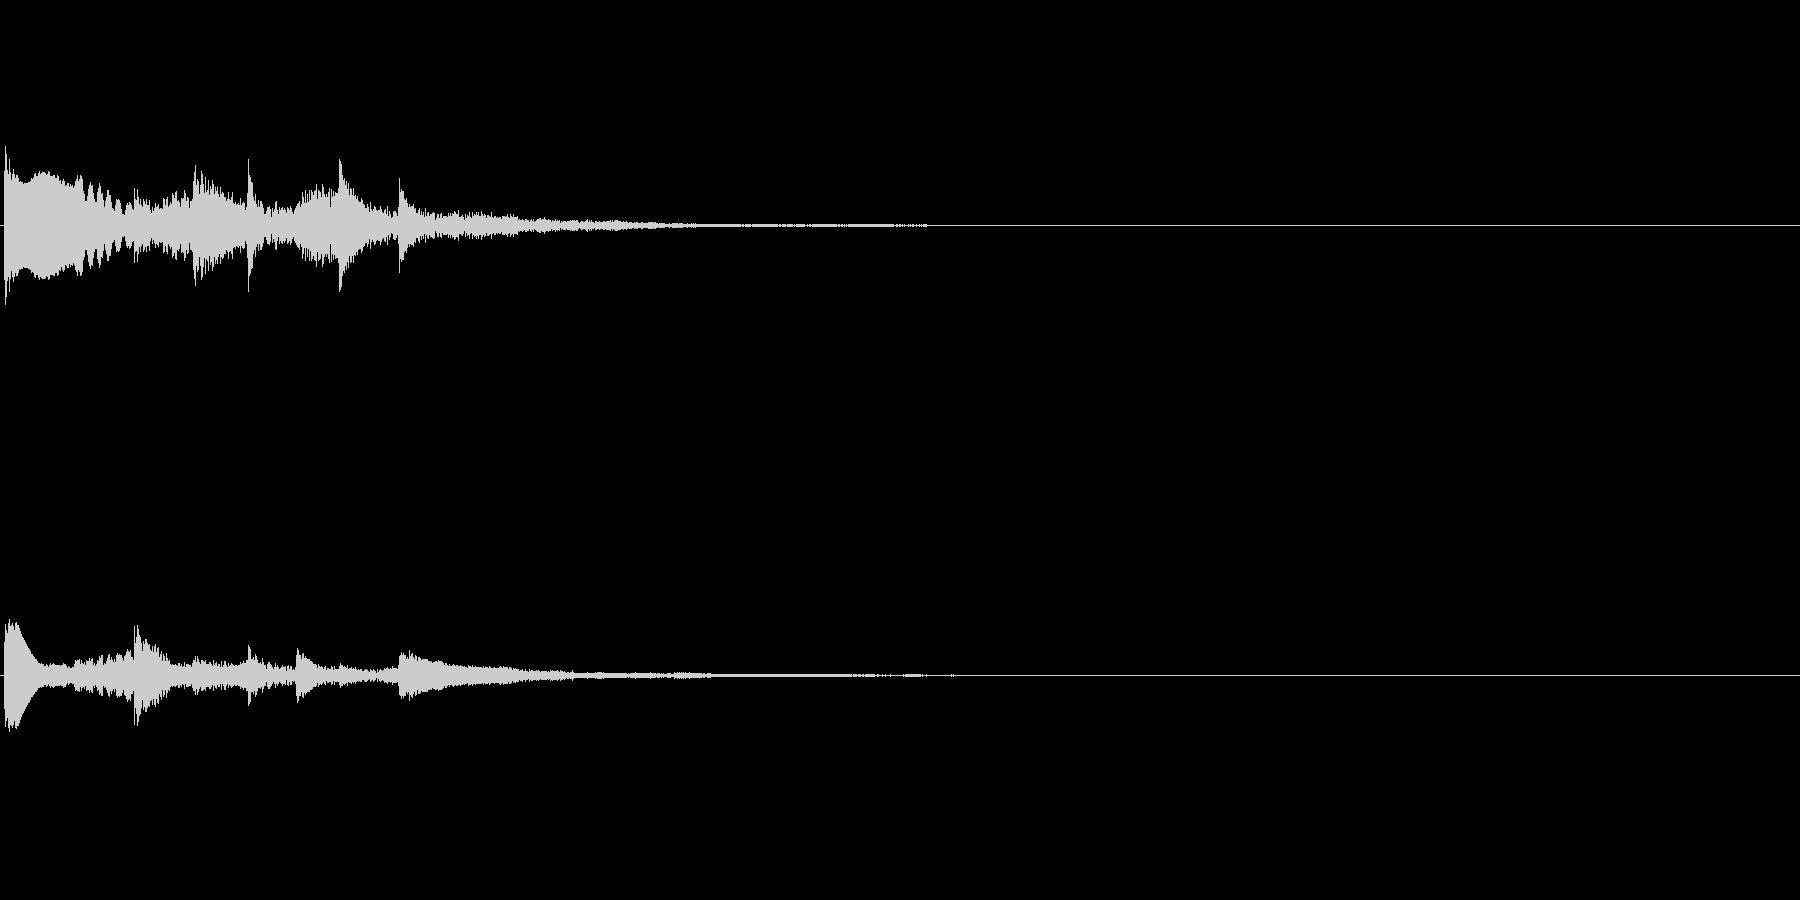 octave_vibeキラキラスロー上昇の未再生の波形